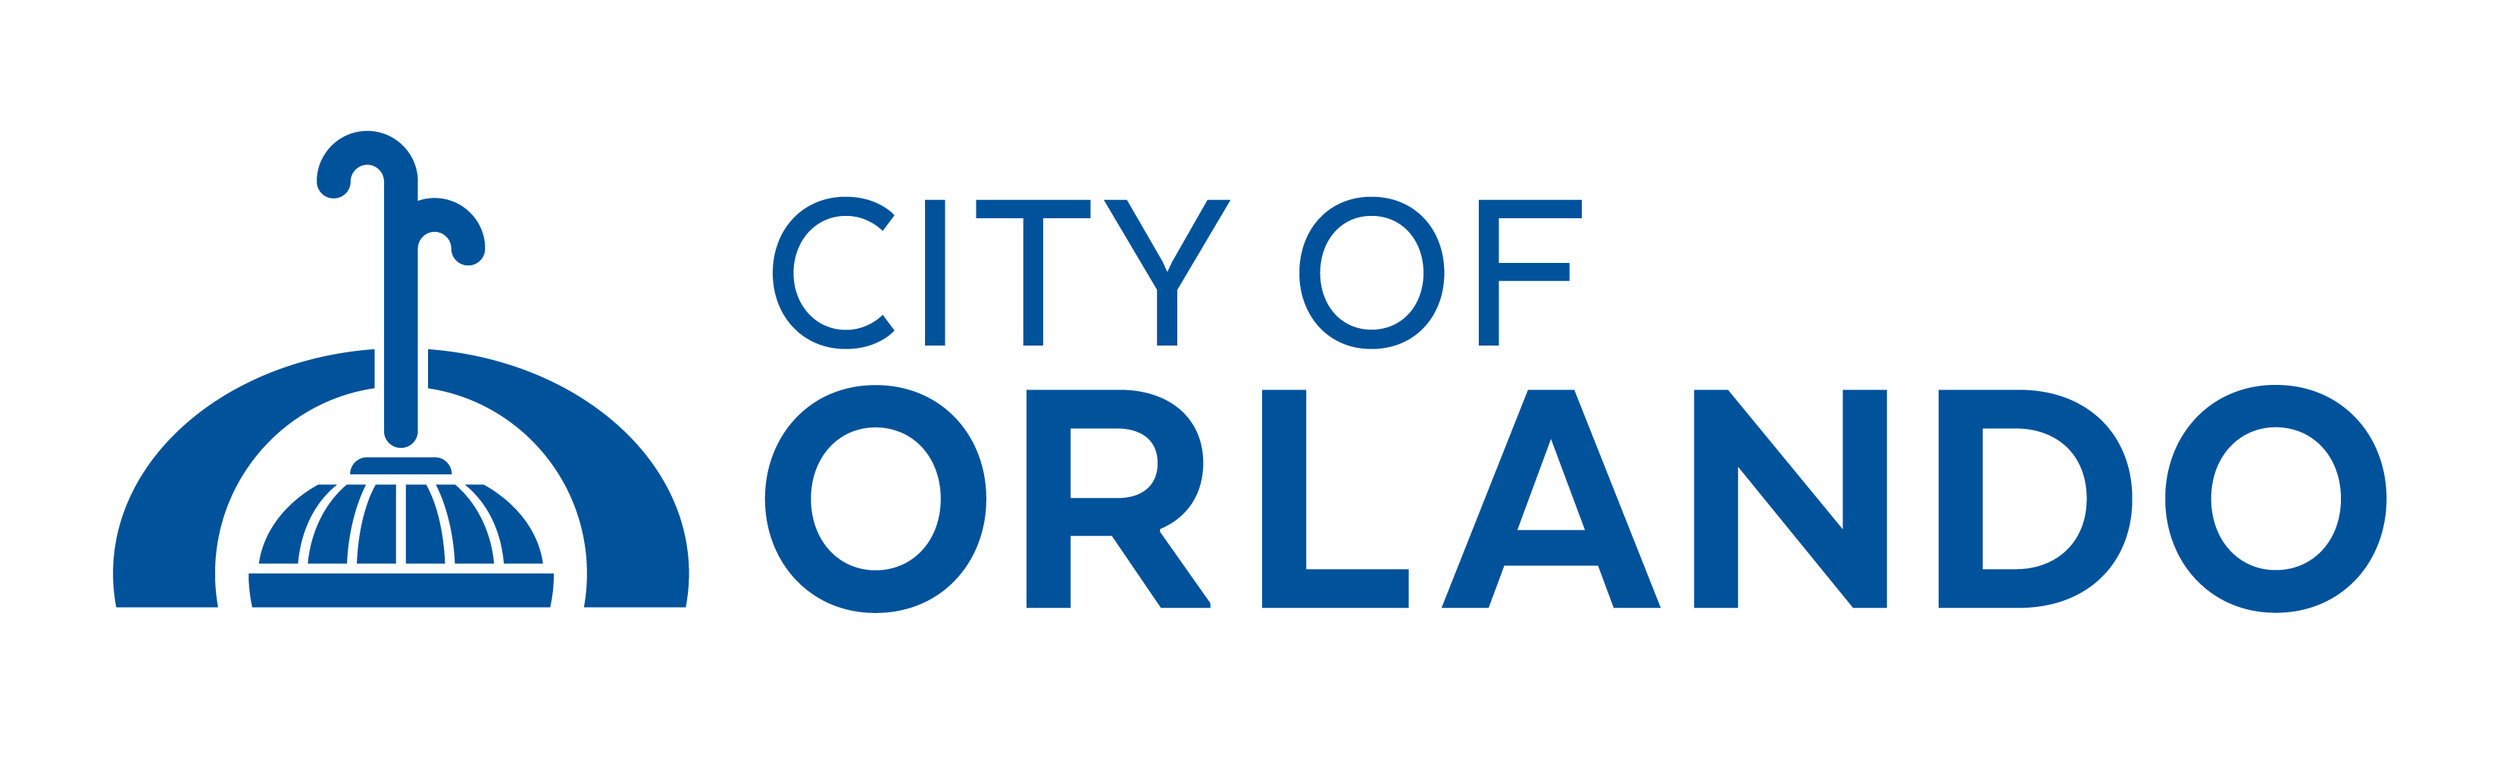 CityofOrlando_Horizontal_RGB.jpg